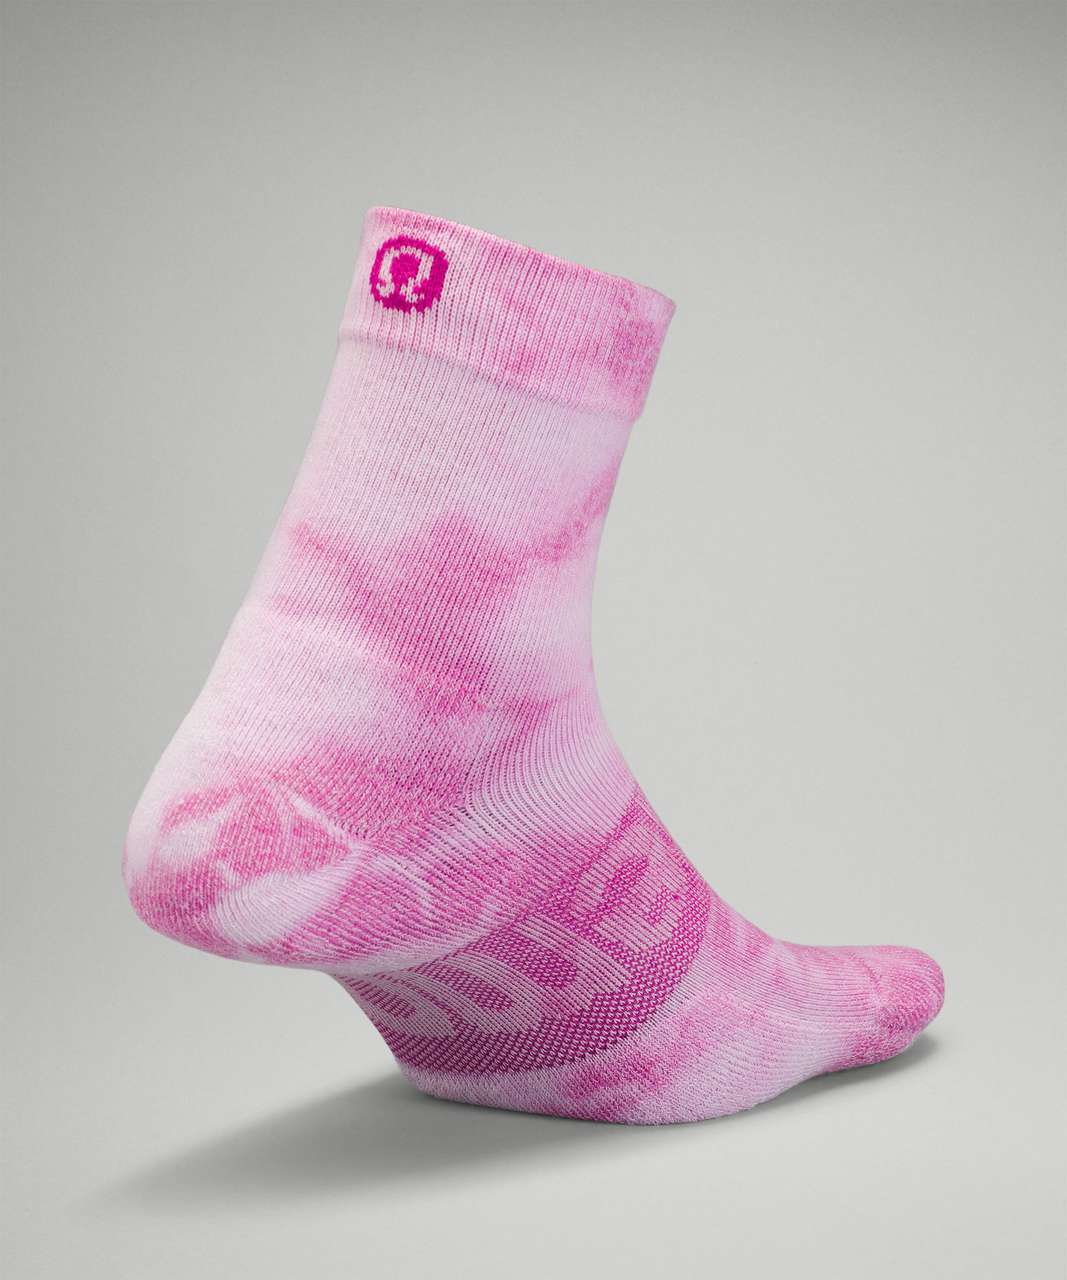 Lululemon Daily Stride Mid-Crew Sock *Tie Dye - Ripened Raspberry